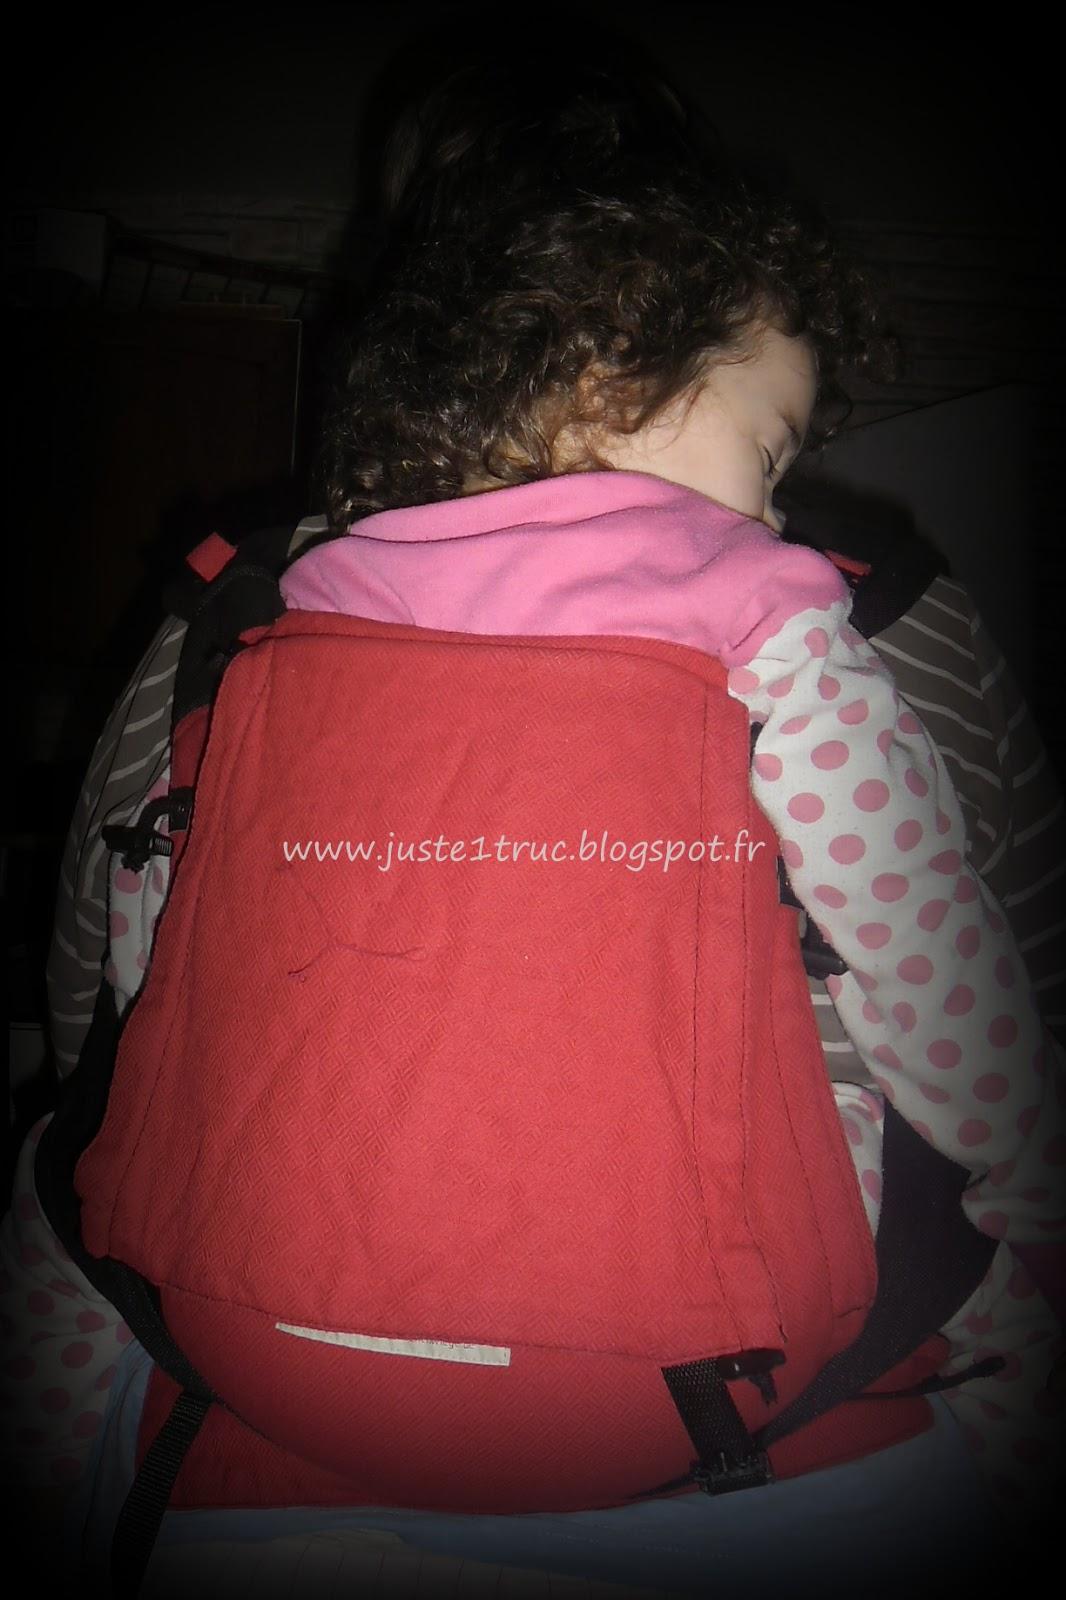 test babycarrier storchenwiege meï-taï meitai babywearing portage avis  mesures bretelles hybride clip boucle sangle 6b9d28fbb9f